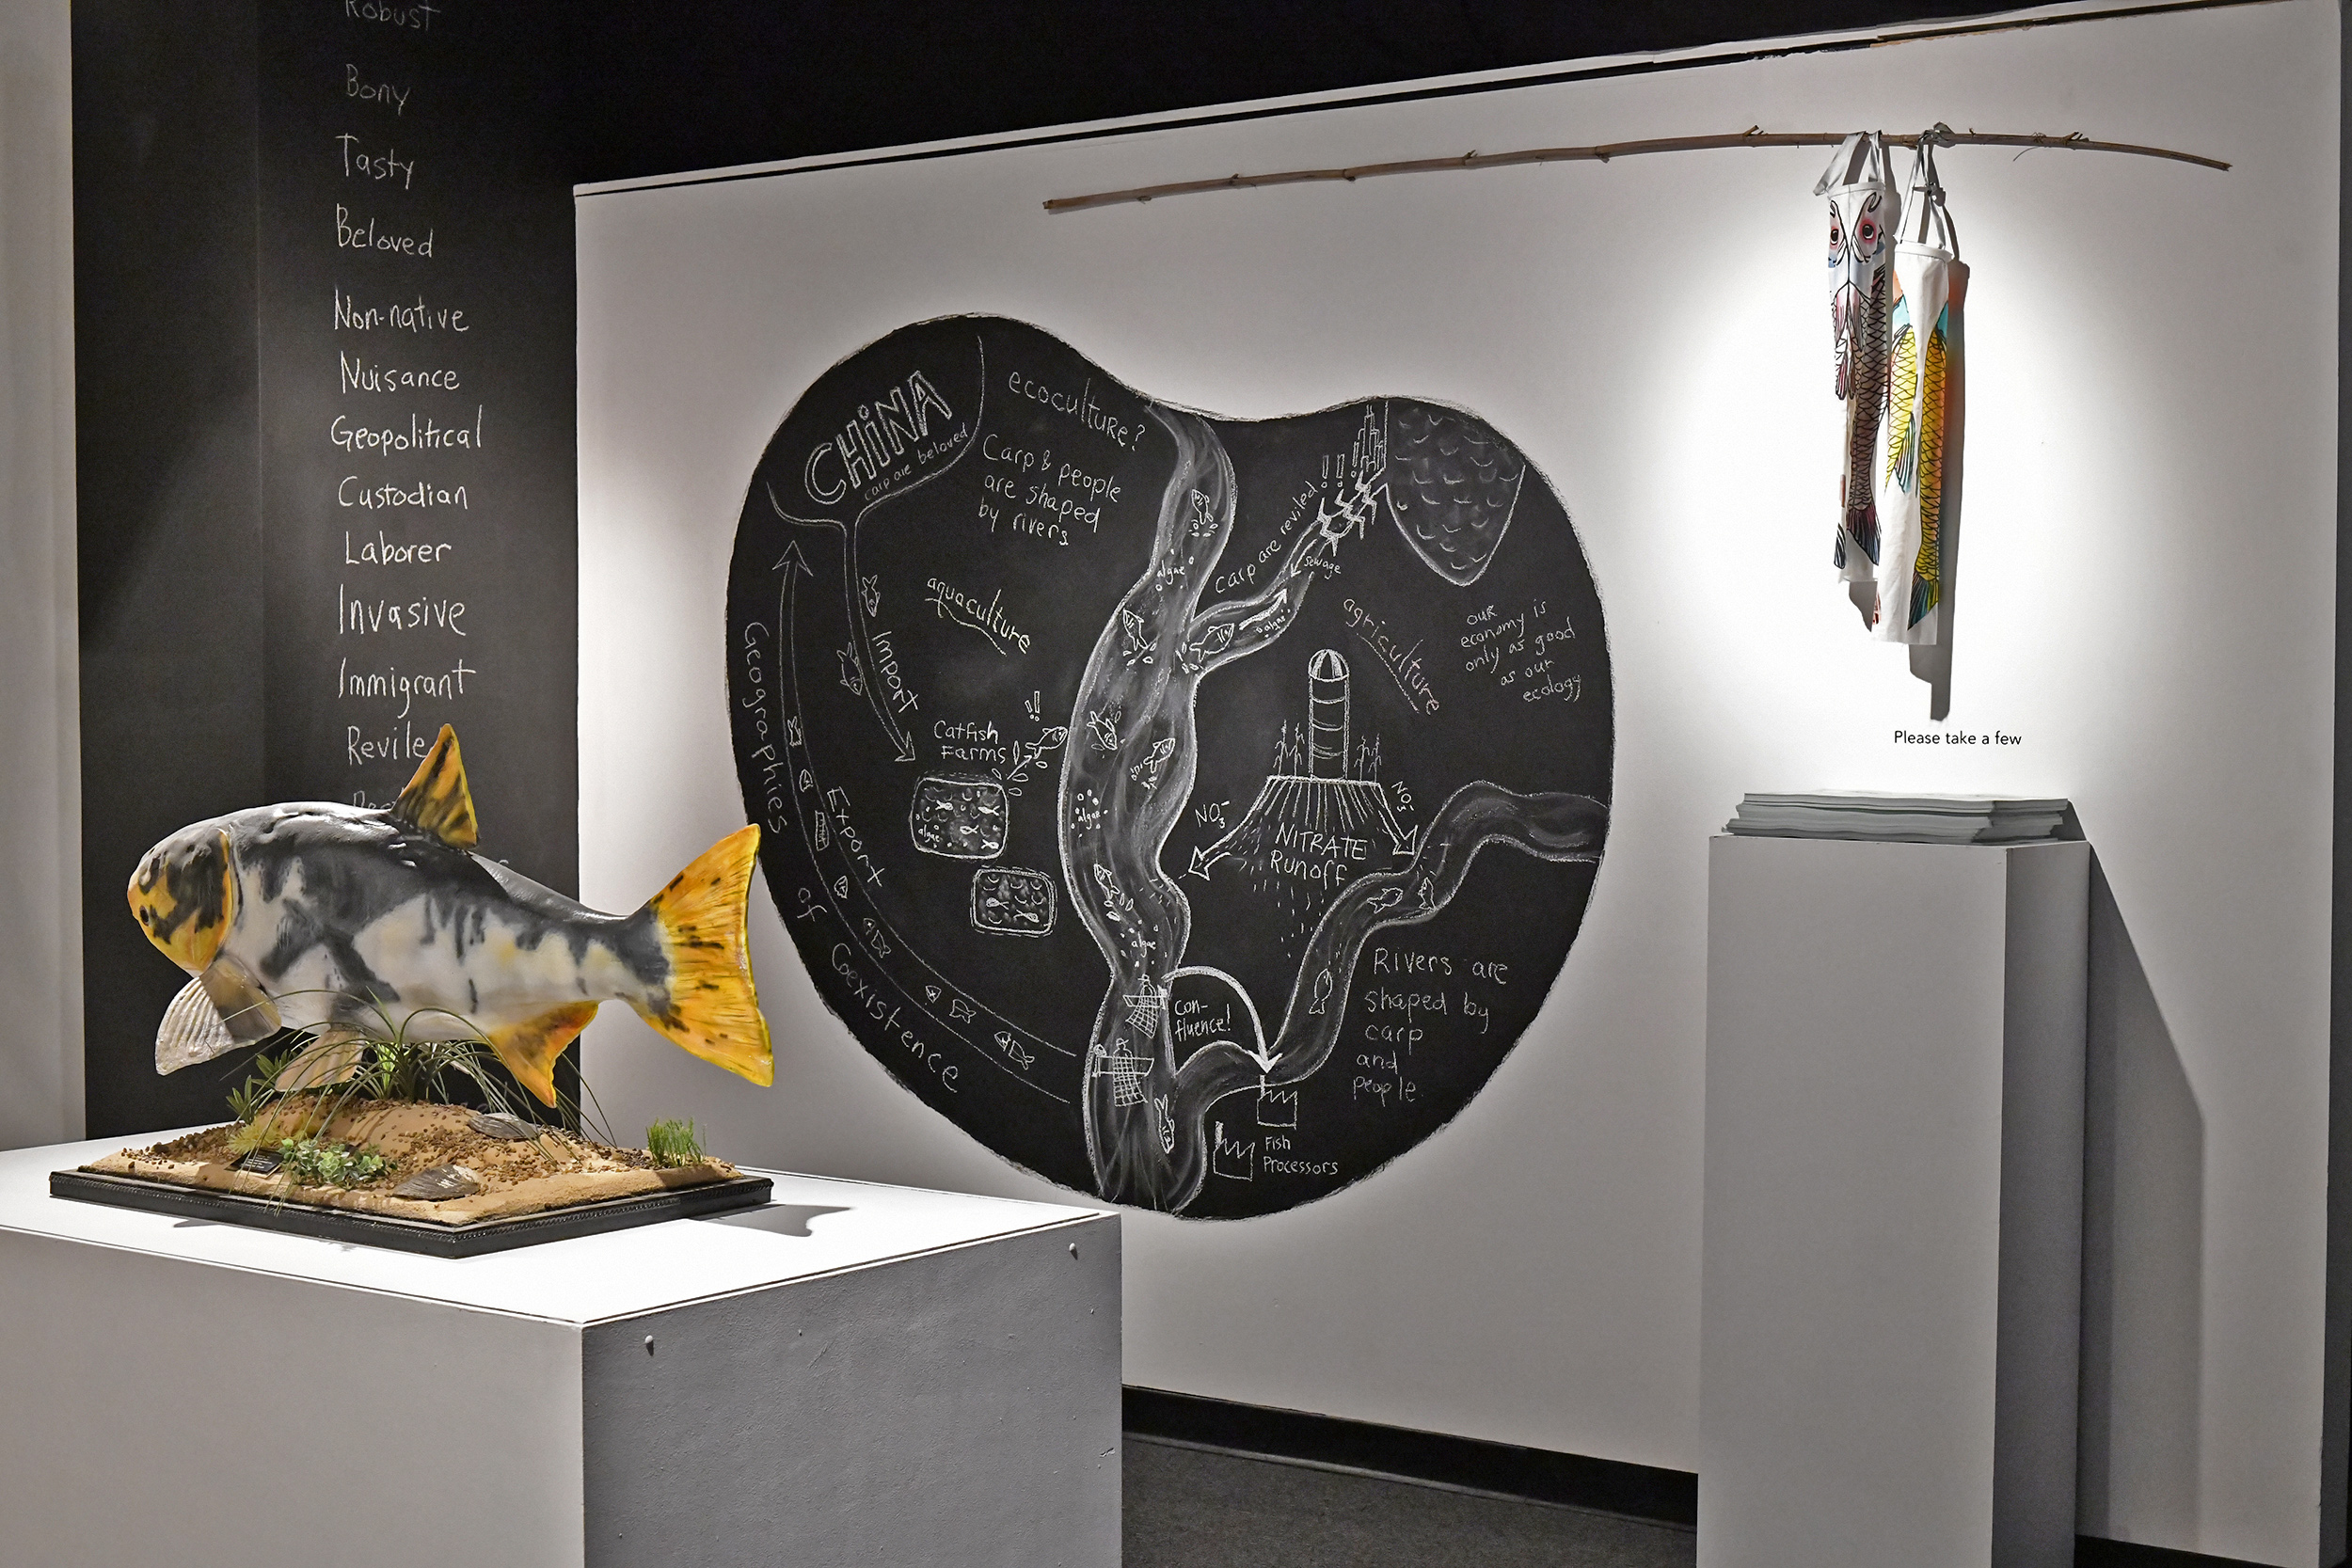 A diagram of the Asian Carp econo-ecology